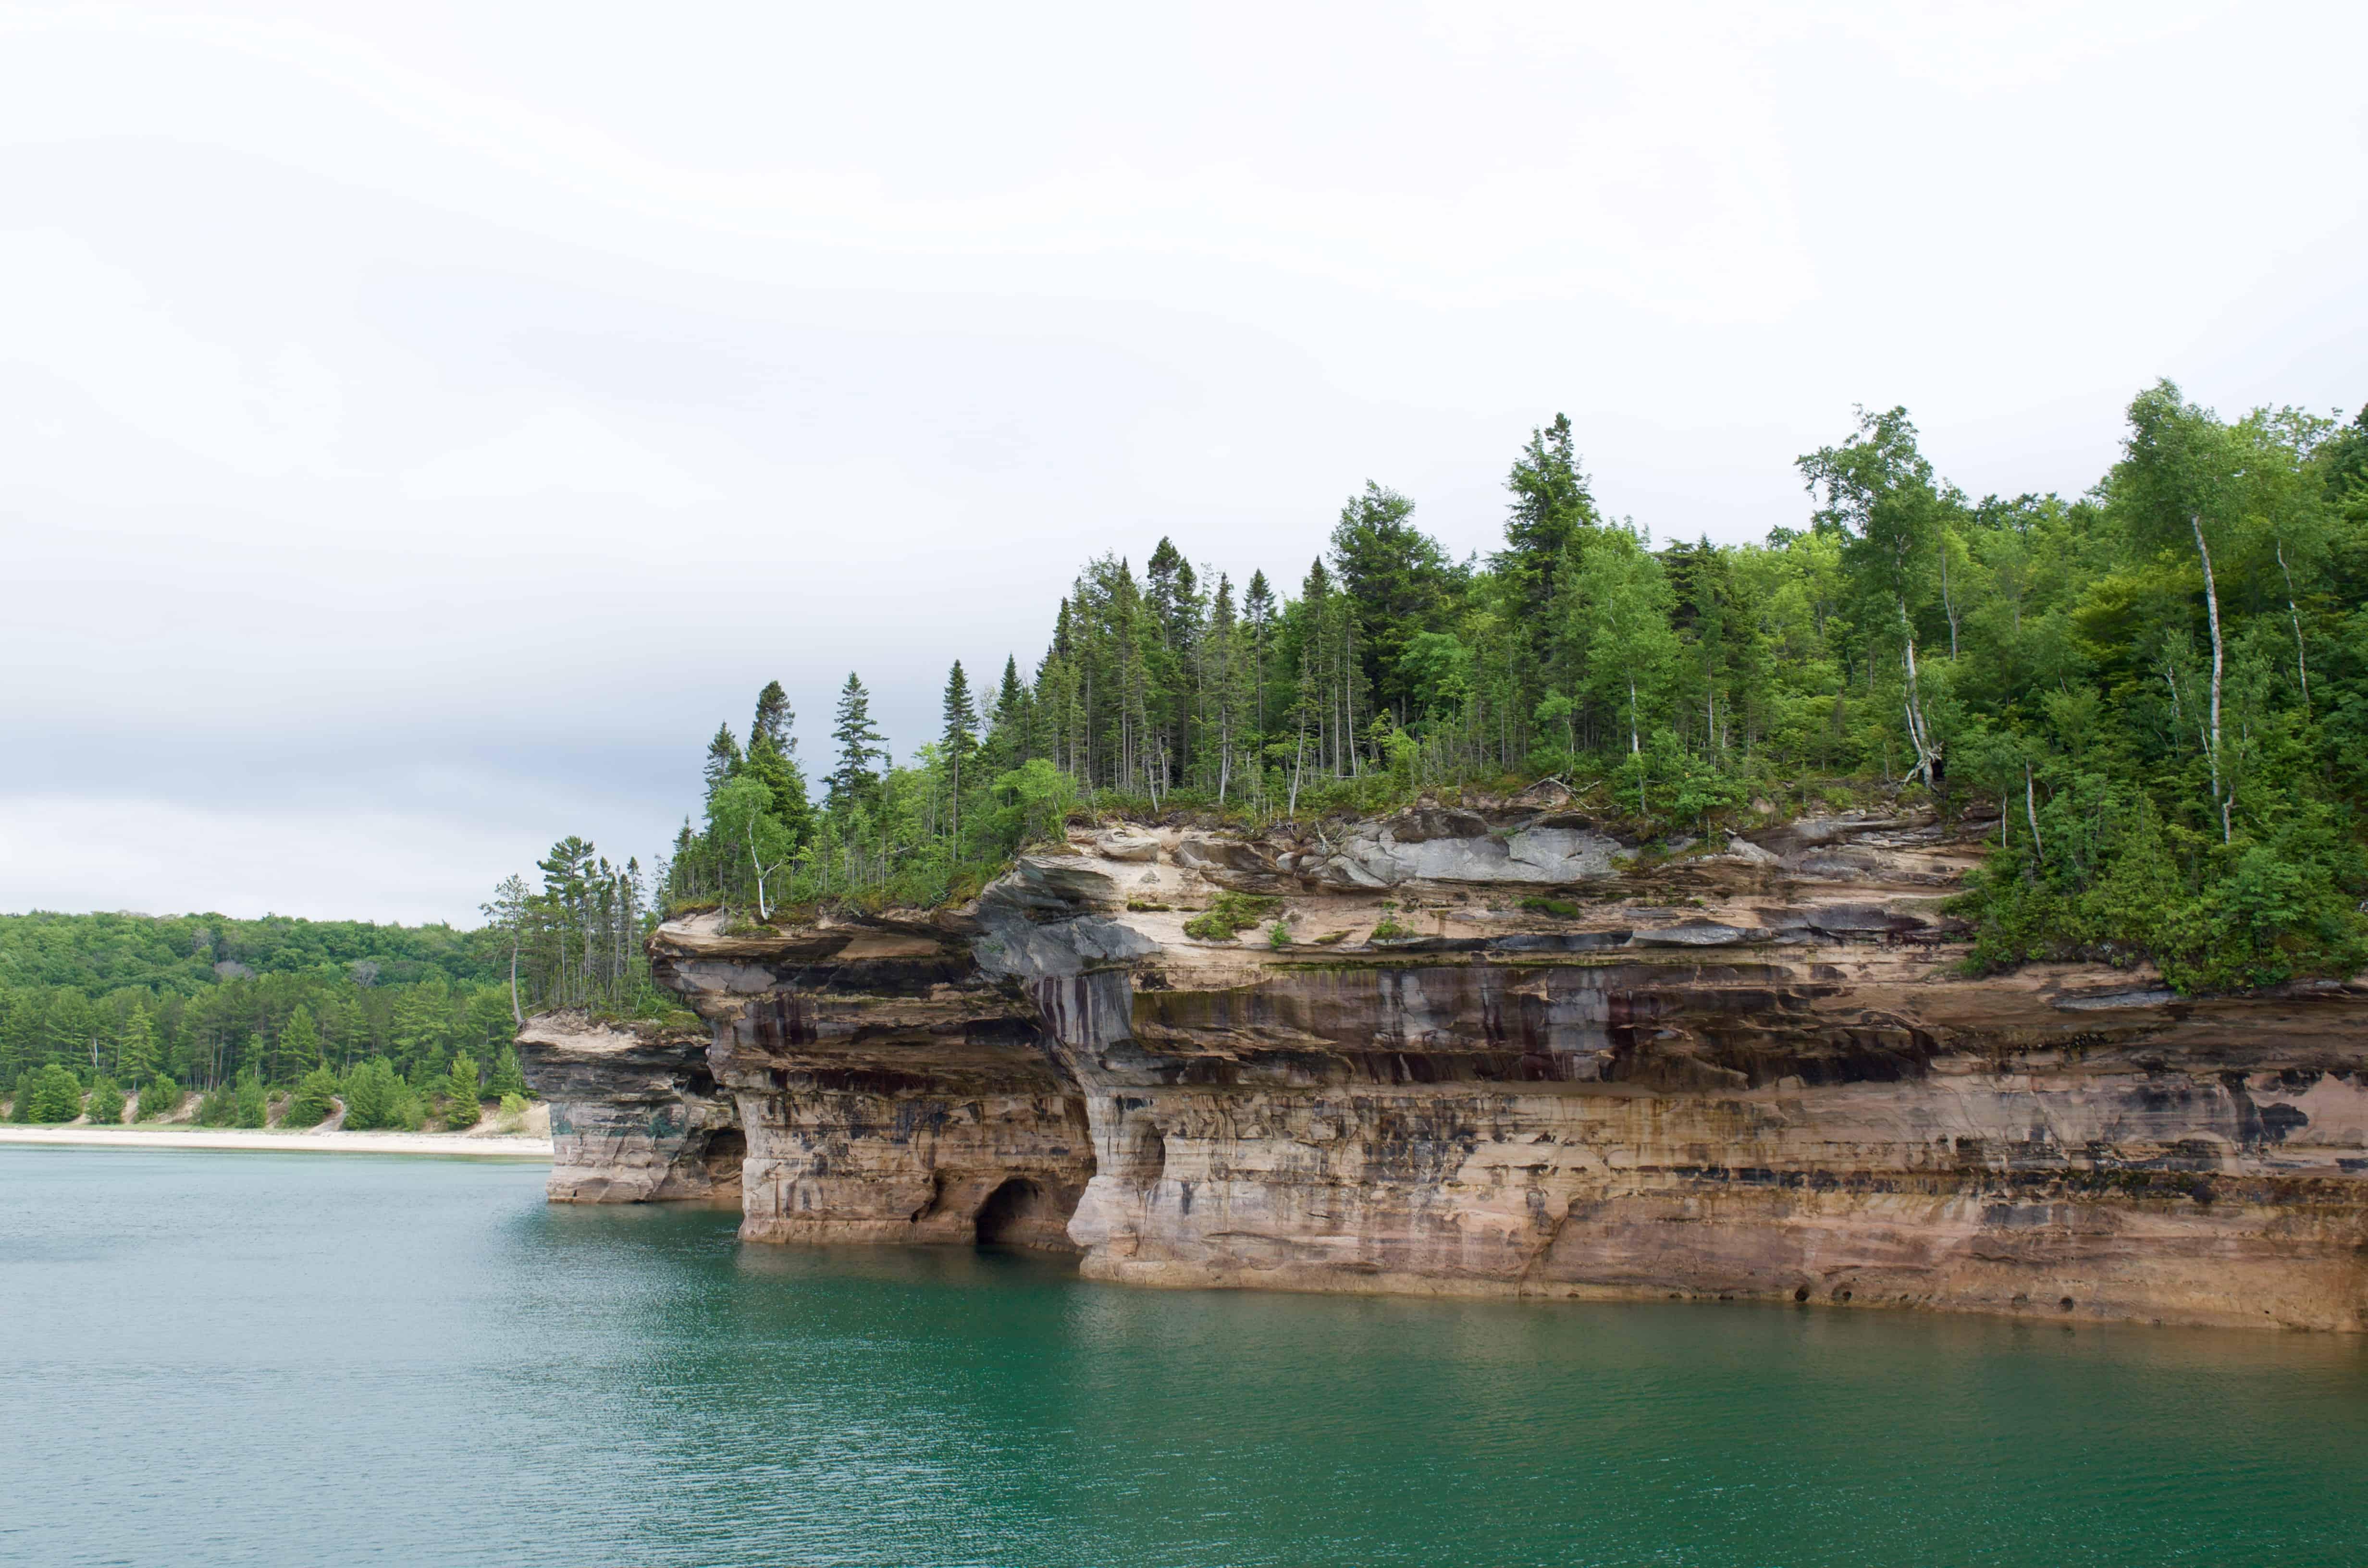 Battleship Row seen on Pictured Rocks Cruise on Lake Superior in Munising Michigan